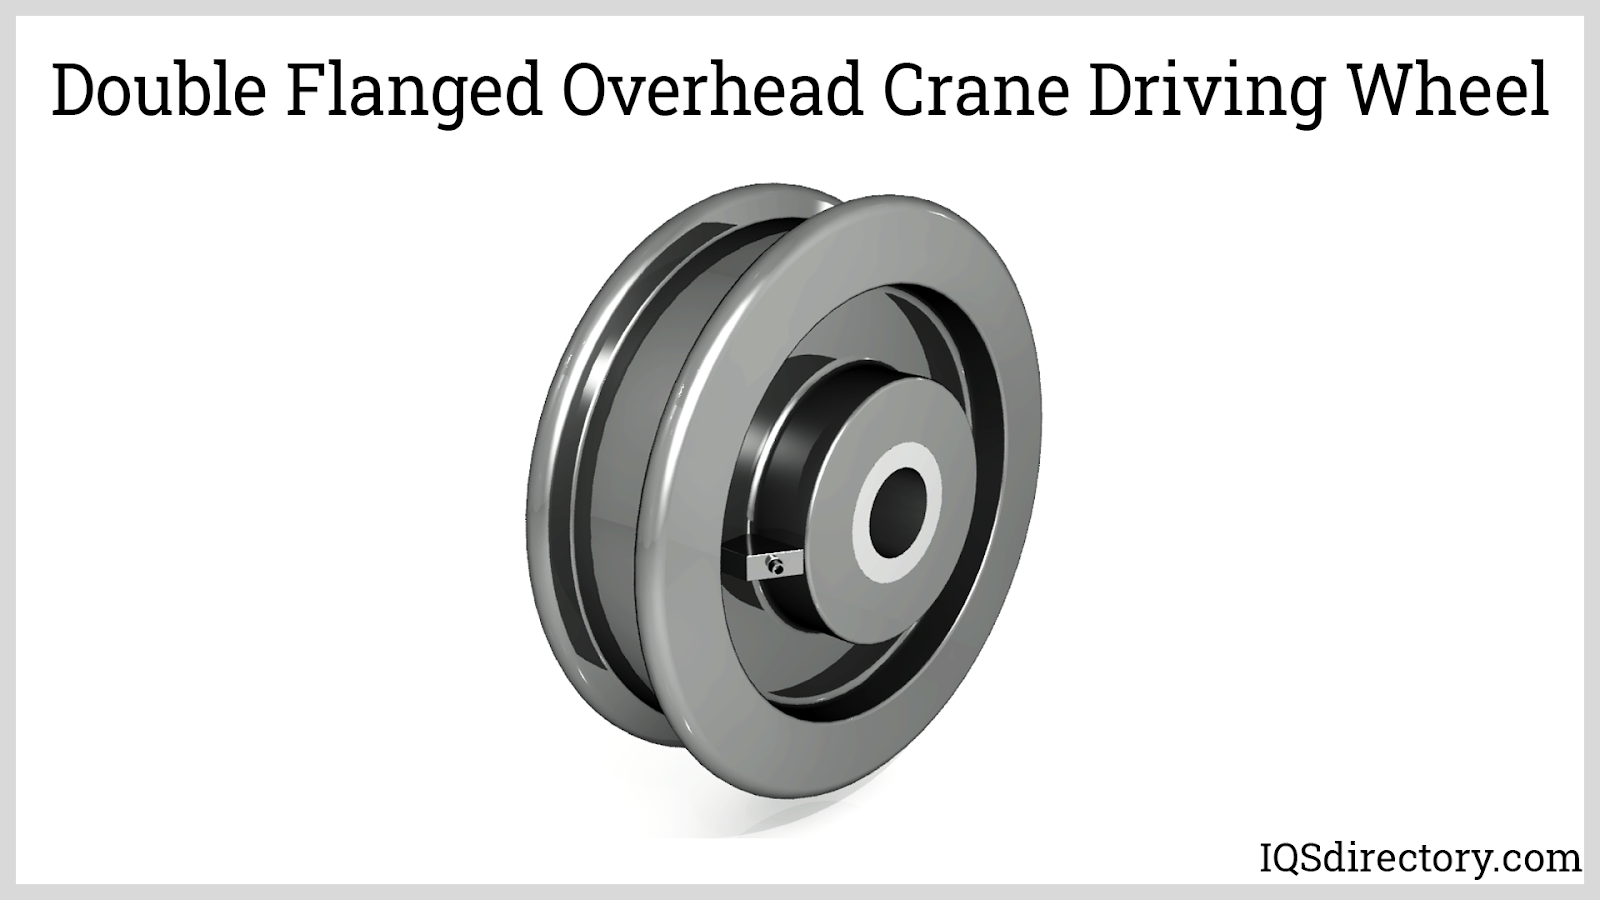 Double Flanged Overhead Crane Driving Wheel